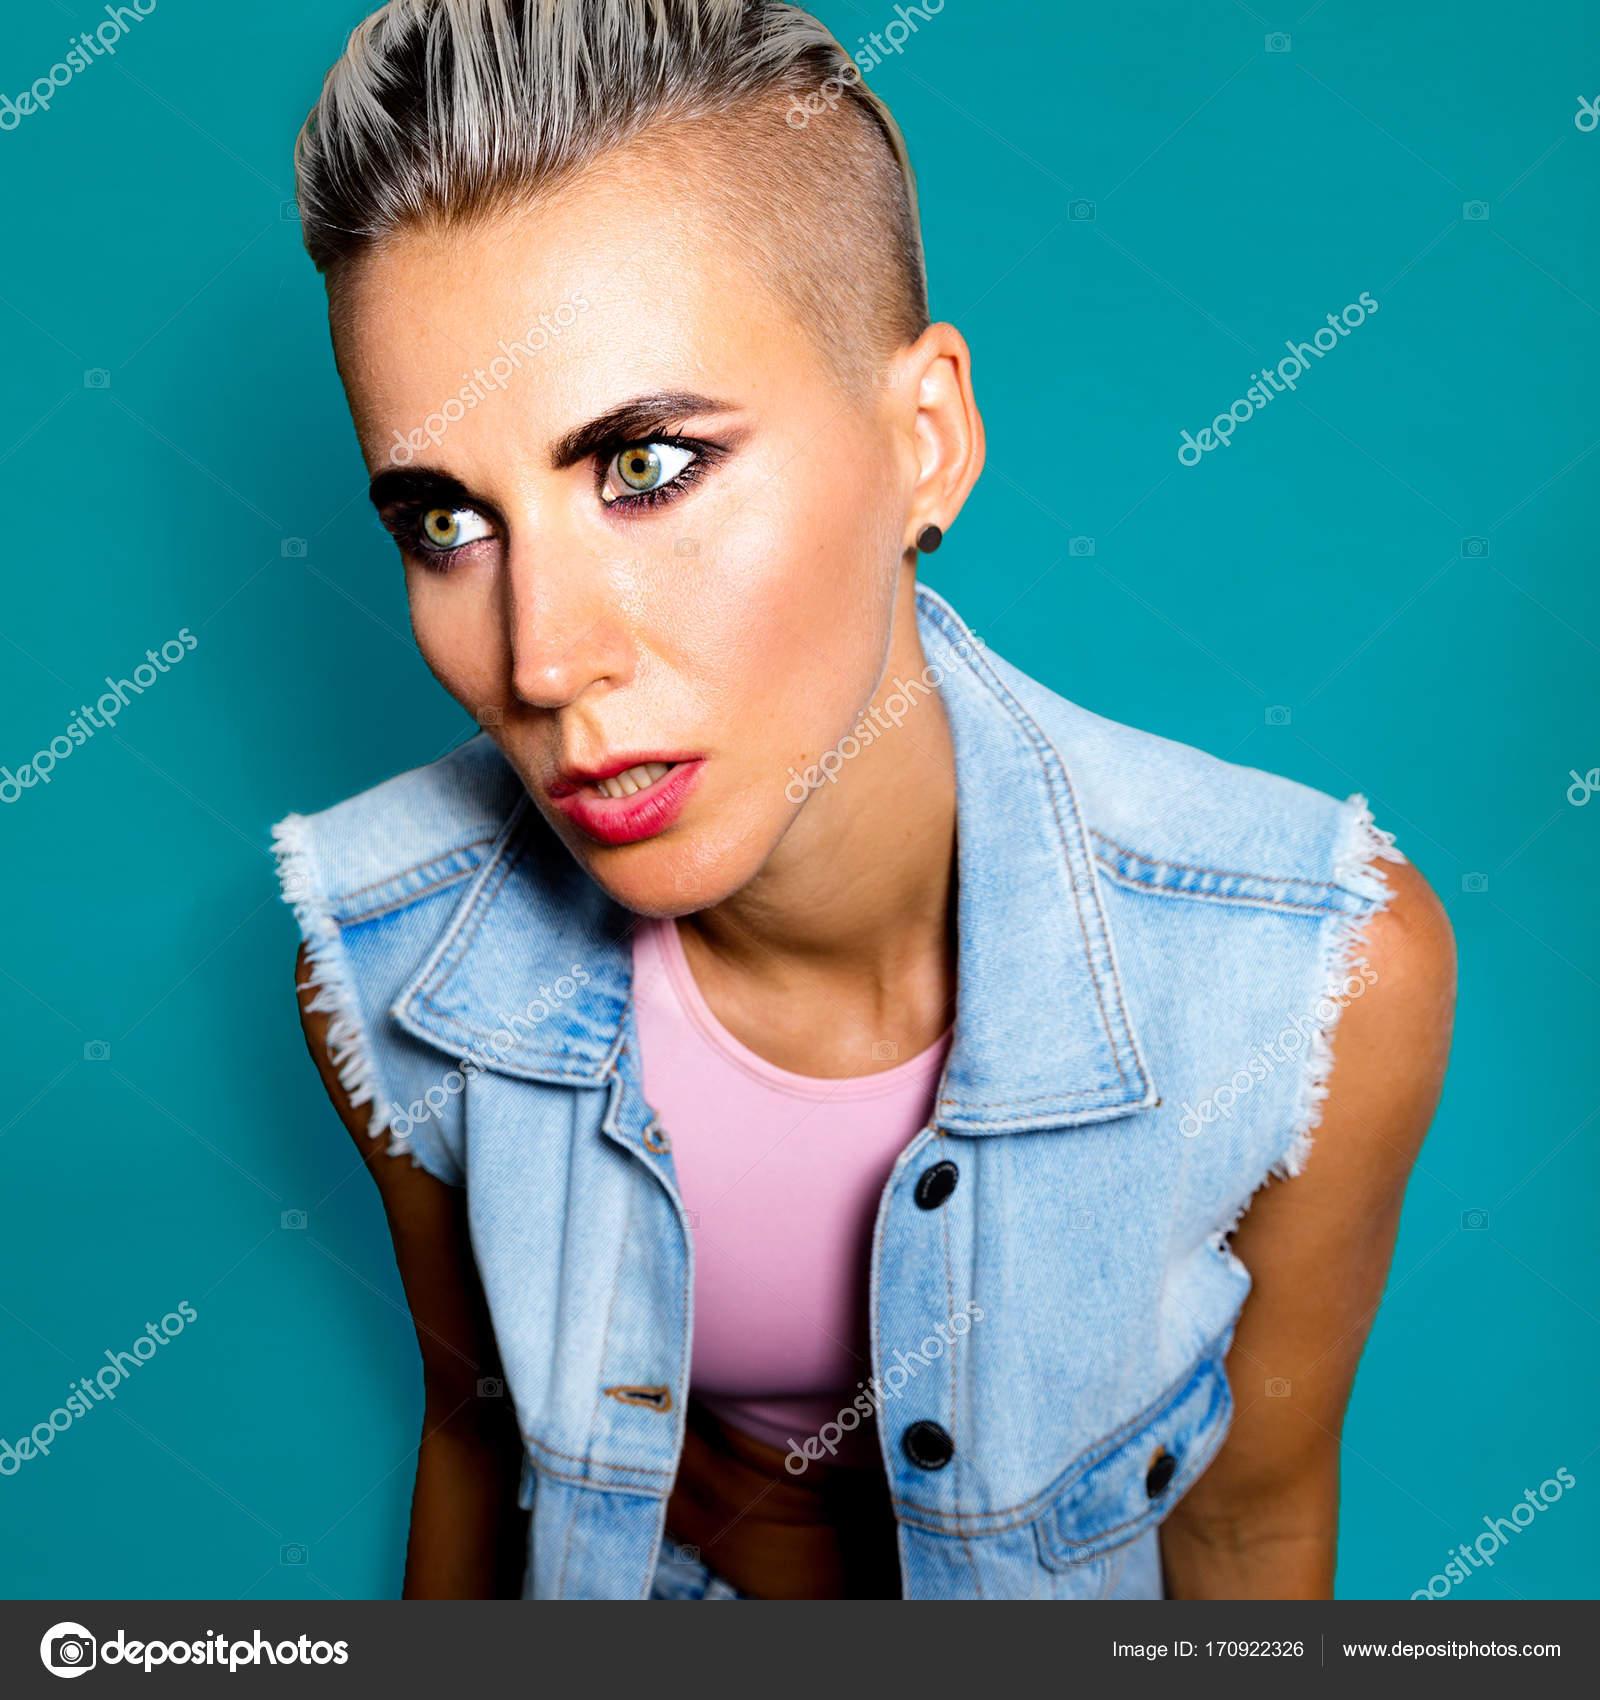 Wildfang Stil Mädchen Mode Frisur Kurze Haare Idee Stockfoto